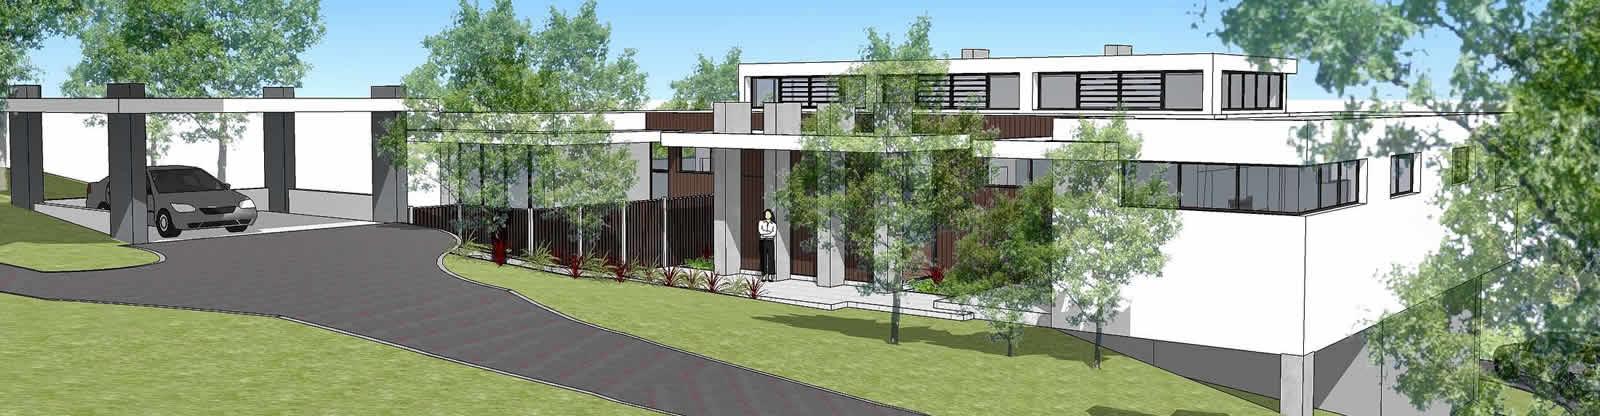 Townhouse design plans melbourne house plan 2017 for Split level home designs melbourne